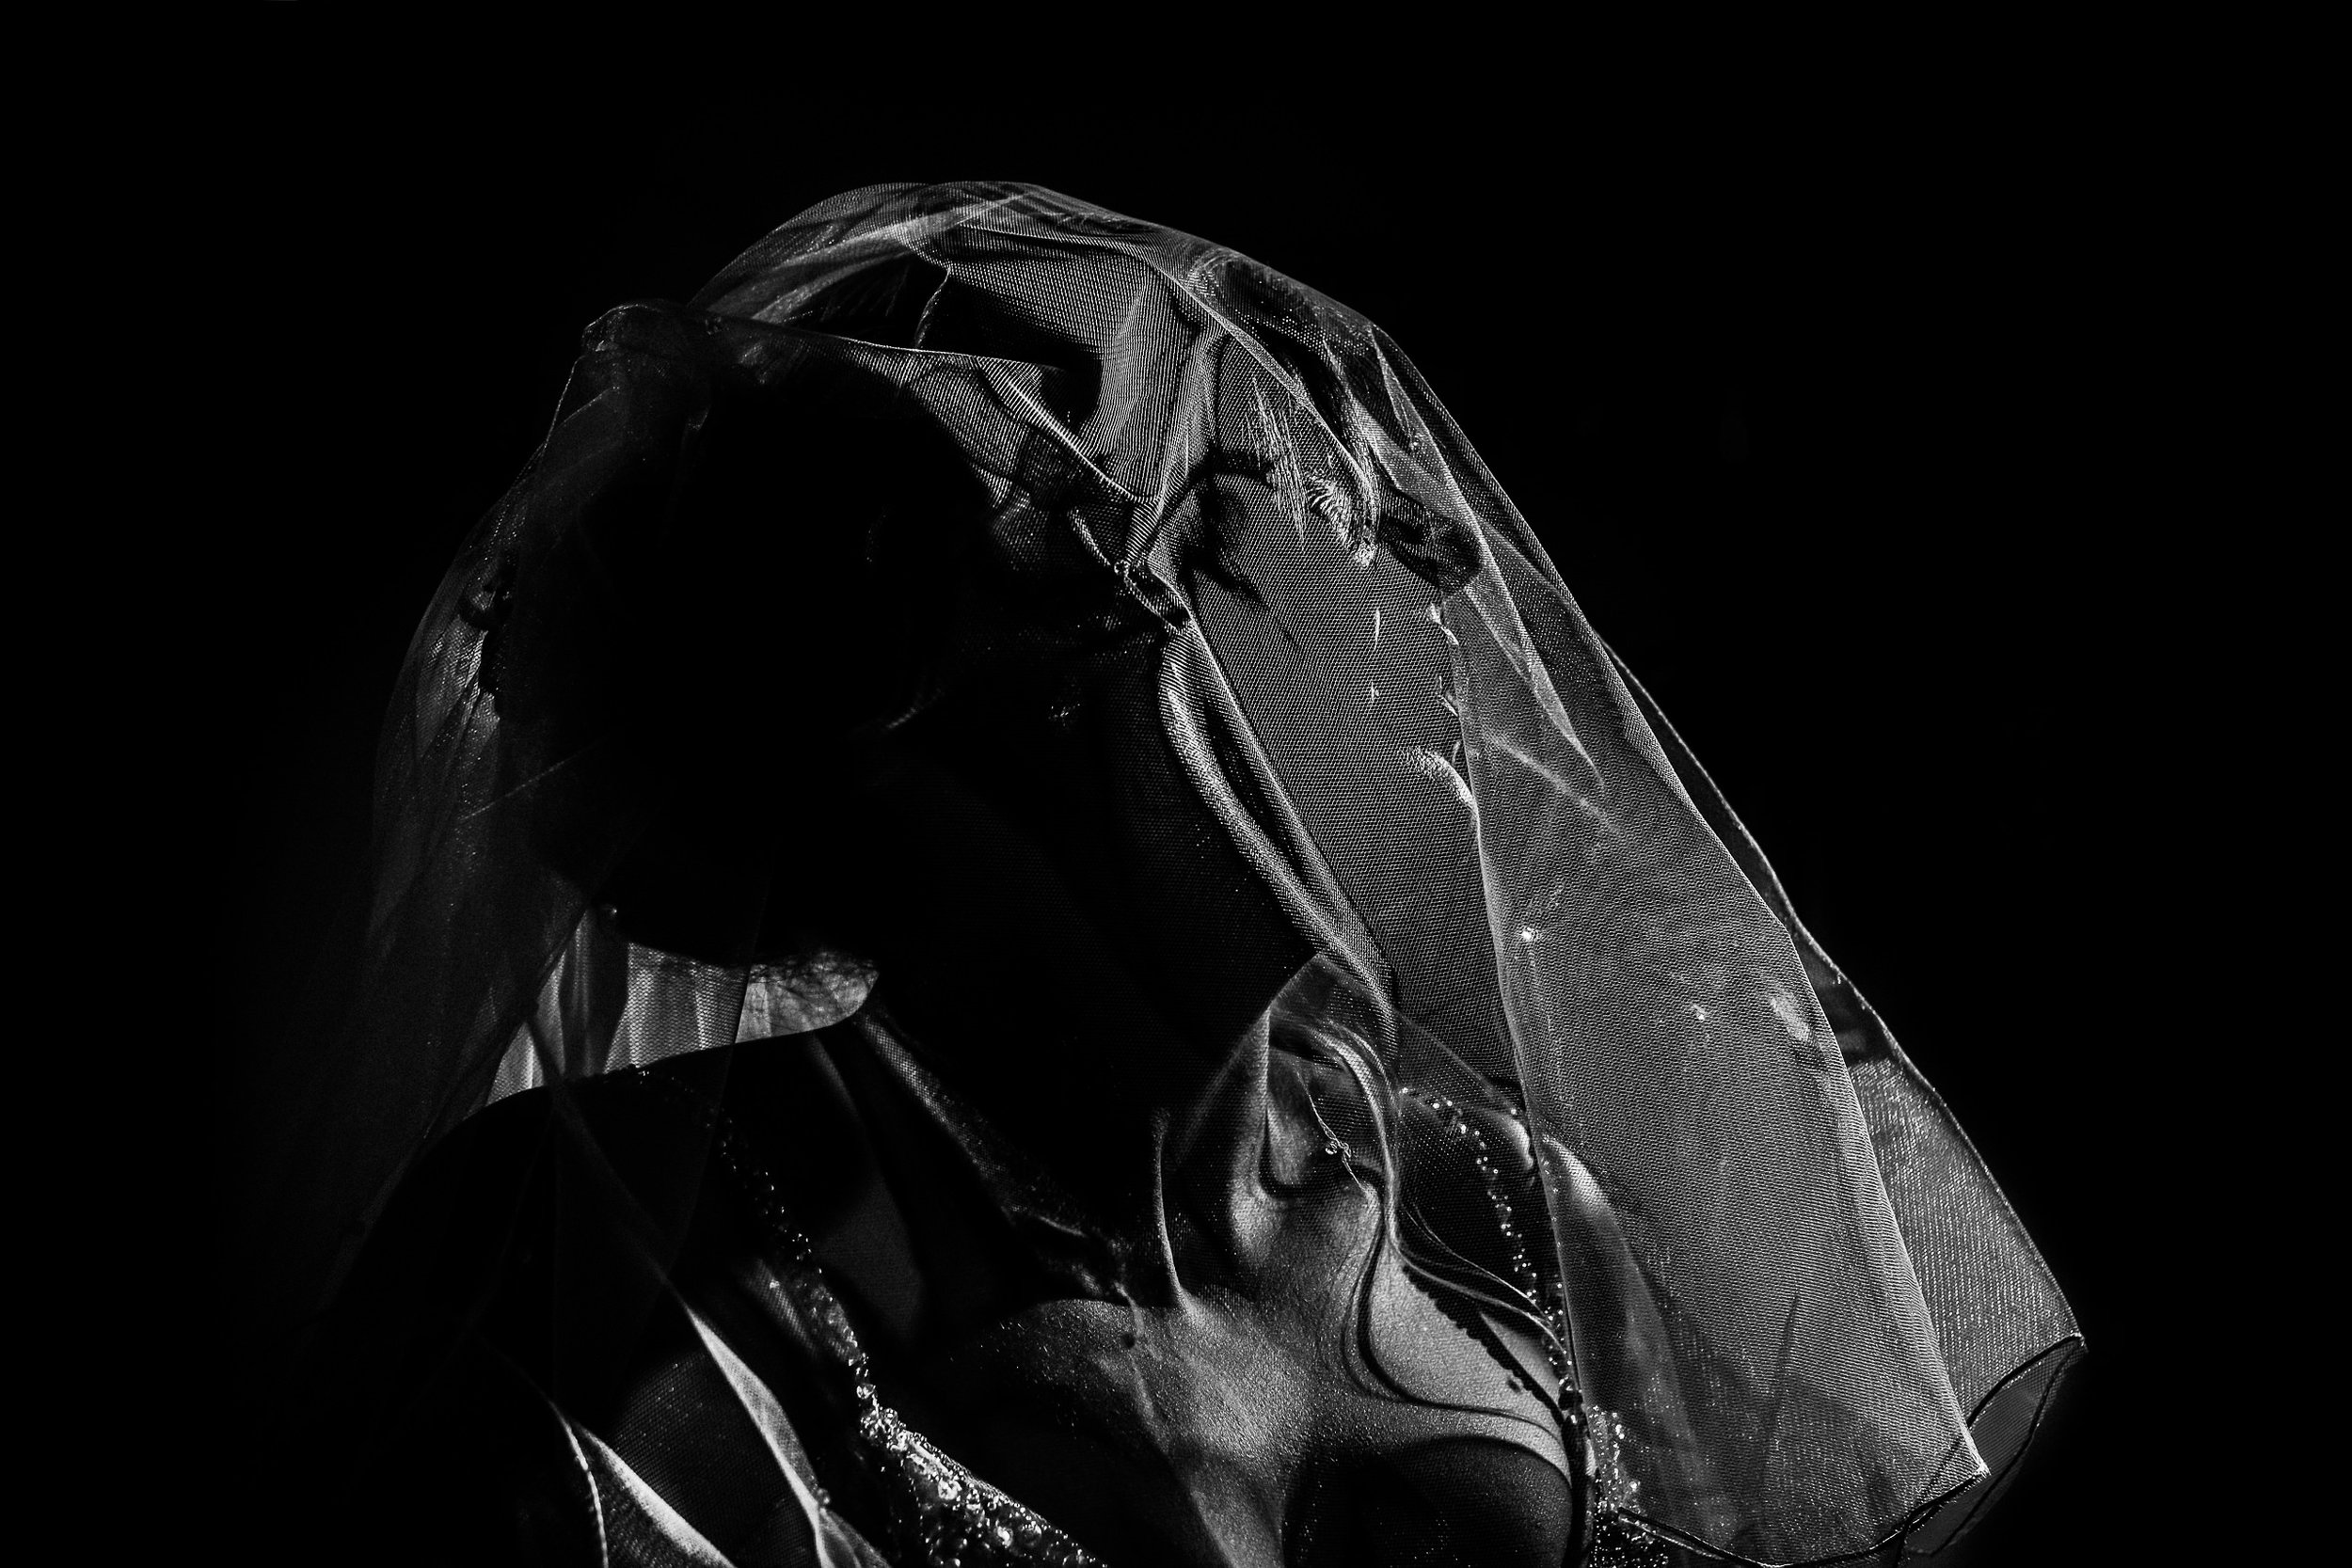 best wedding photo bride portrait in toulouse